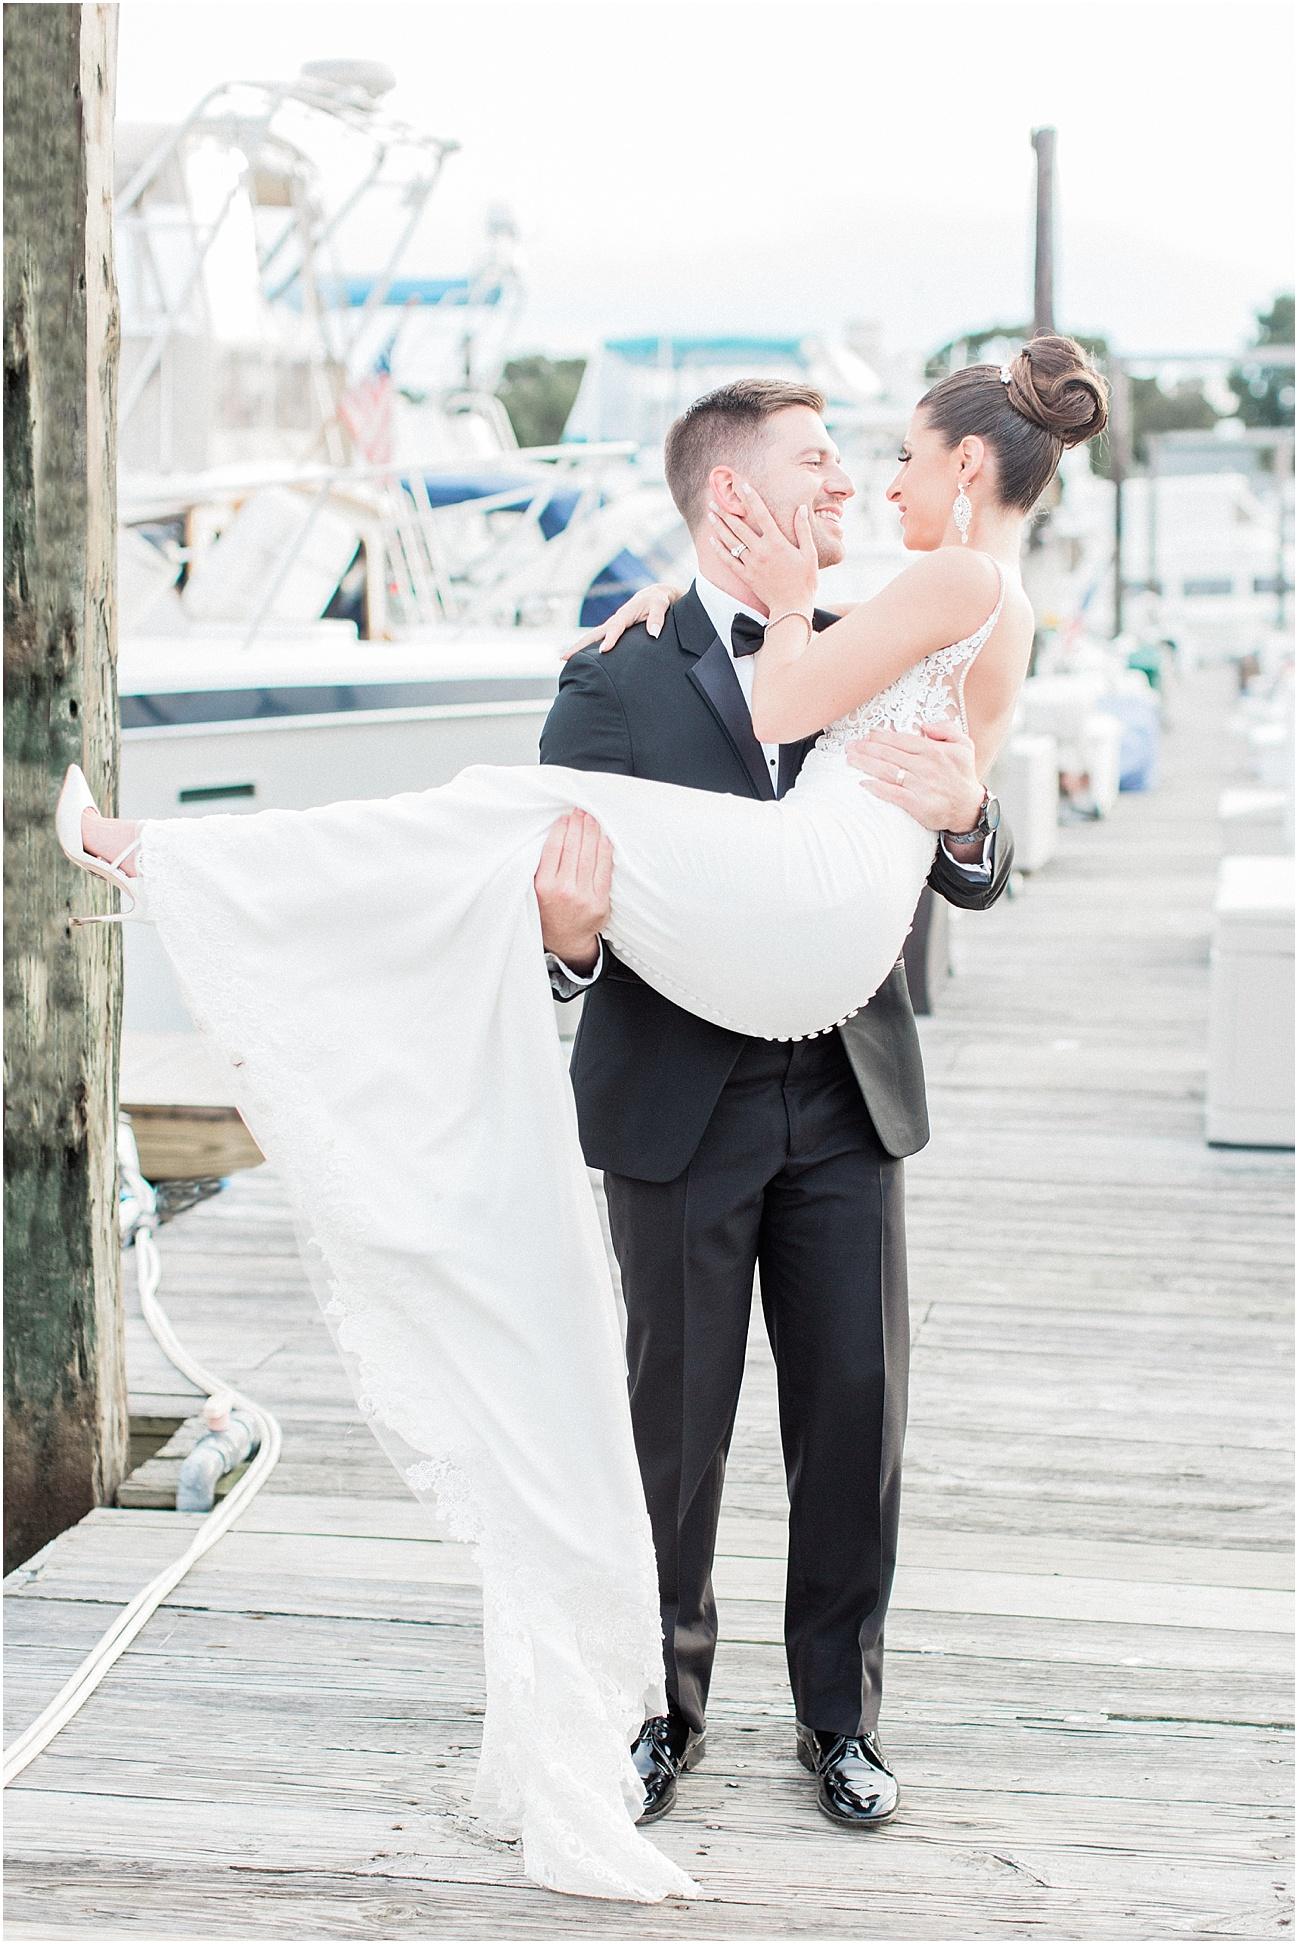 bianca_chris_danversport_italian_blush_gold_north_shore_cape_cod_boston_wedding_photographer_meredith_jane_photography_photo_1144.jpg